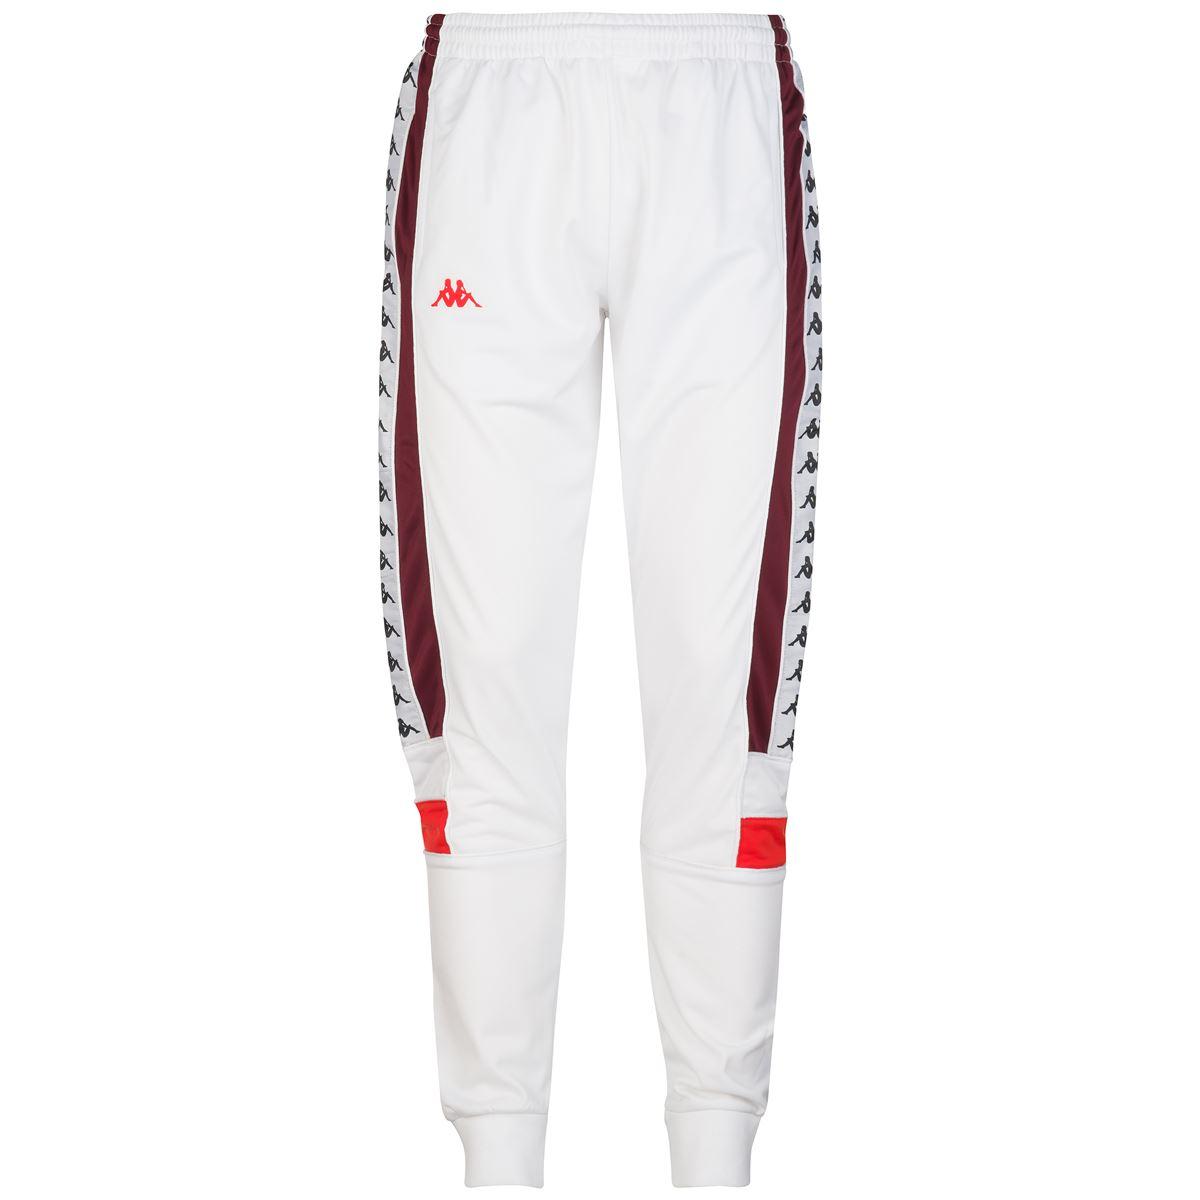 Pantalone da uomo in tricot garzato Kappa | Pantalone | 303LP70BY0 WHITE-RED DAHLIA